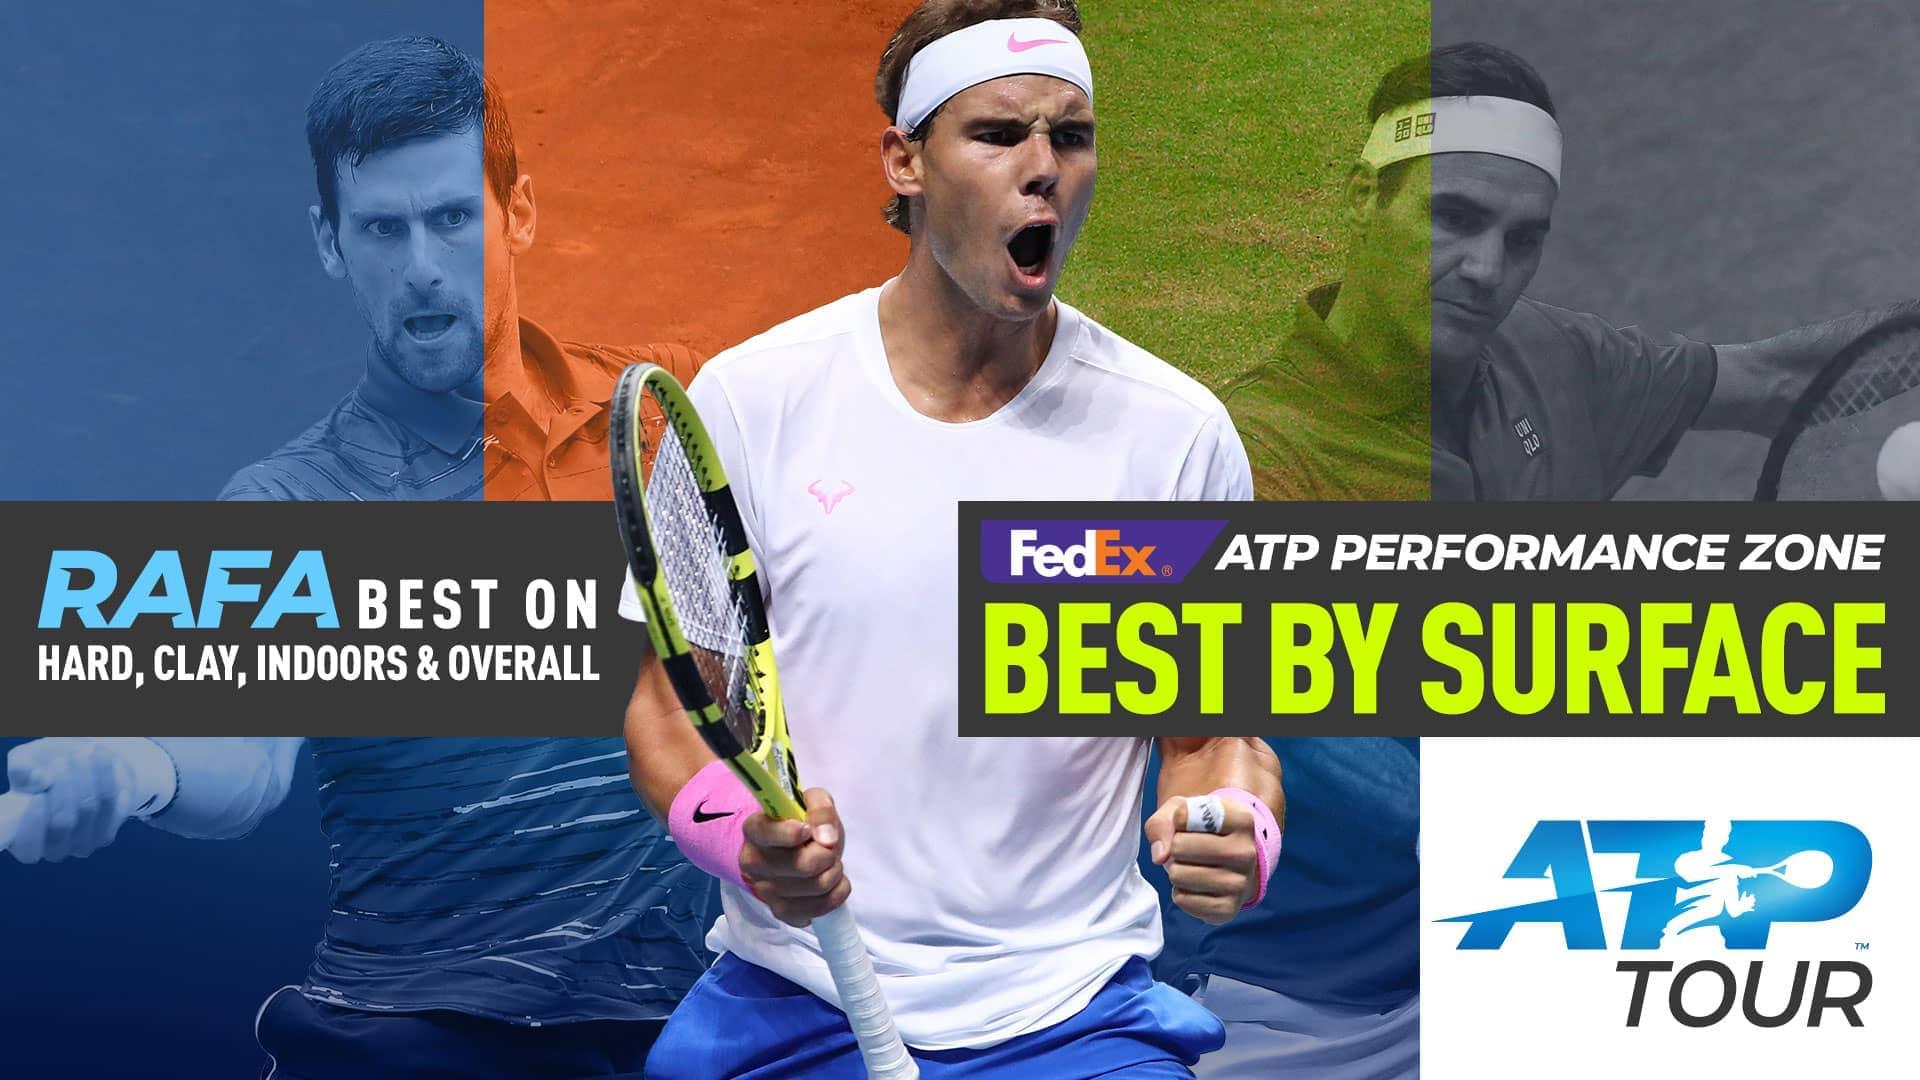 Rafael Nadal, Novak Djokovic & Roger Federer Among Surface Leaders In 2019 | ATP Tour | Tennis